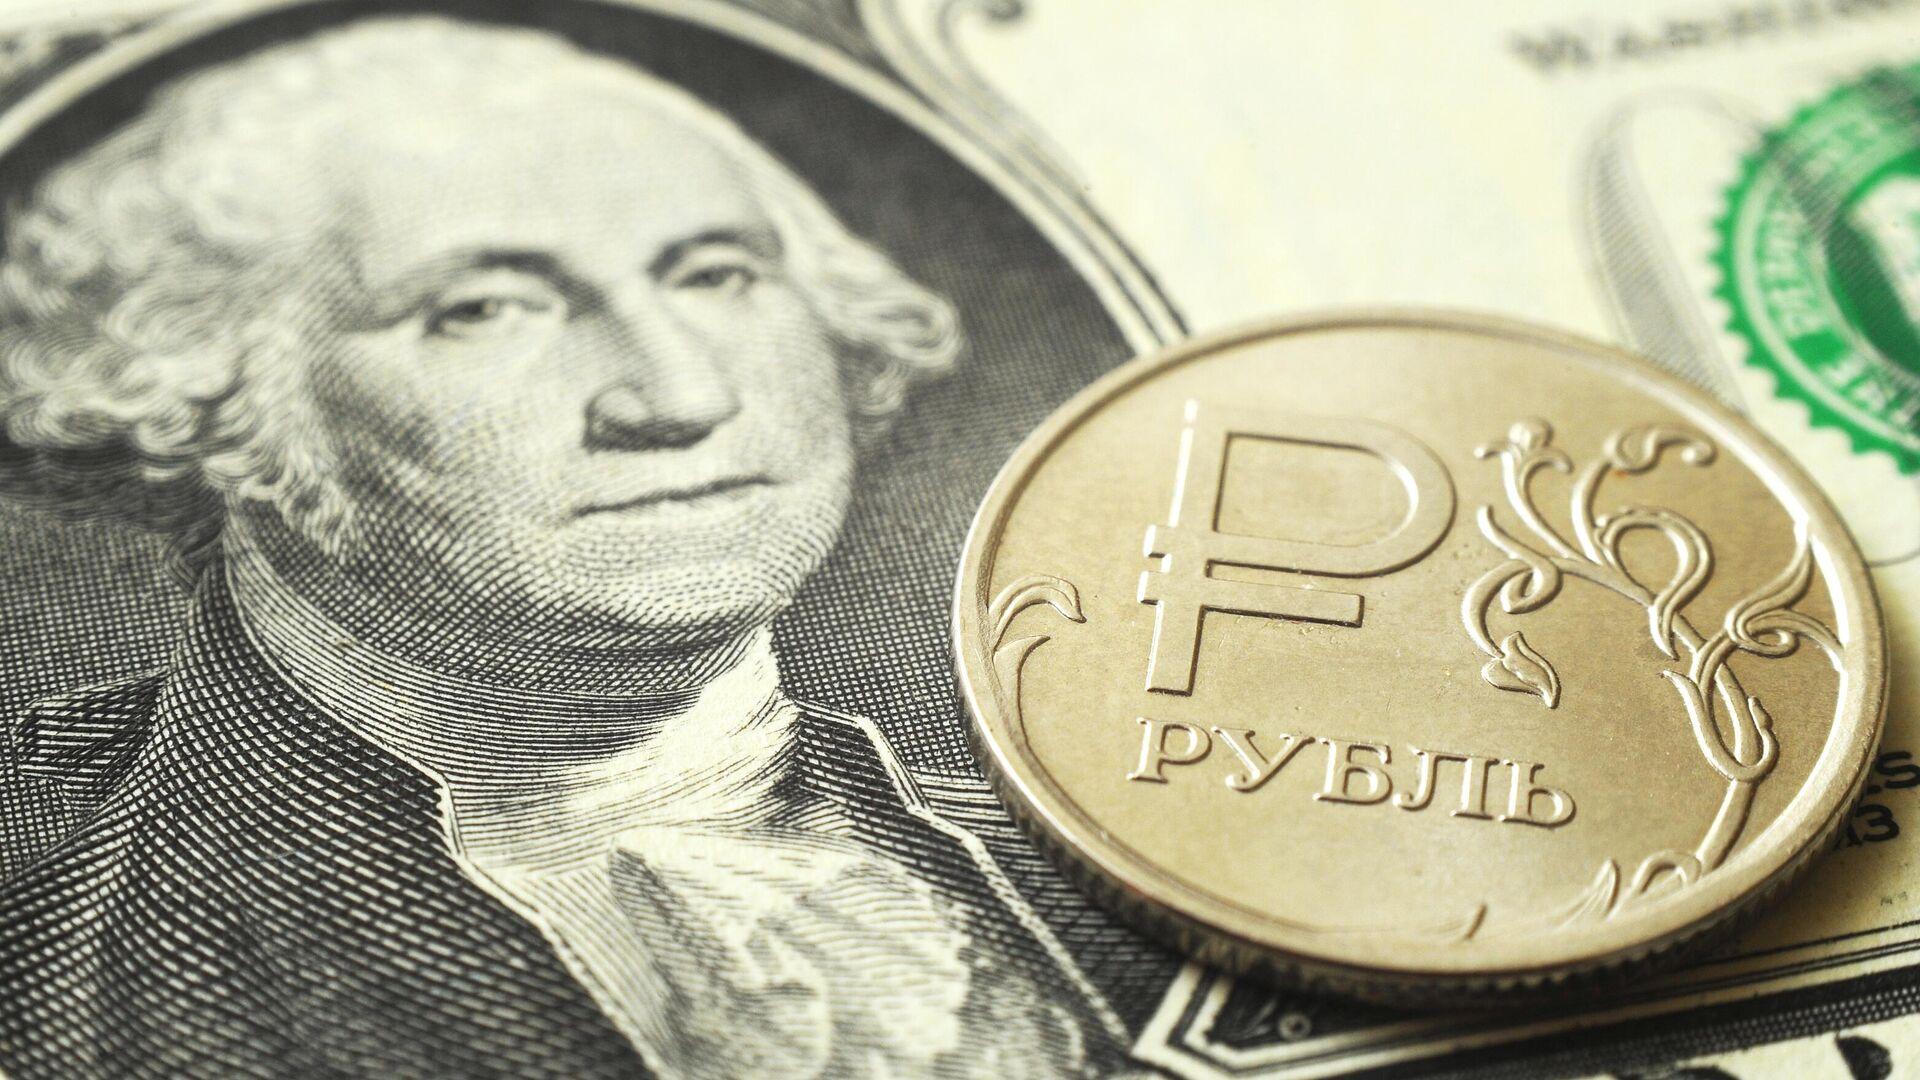 Экономист раскрыл планы США по подрыву рубля